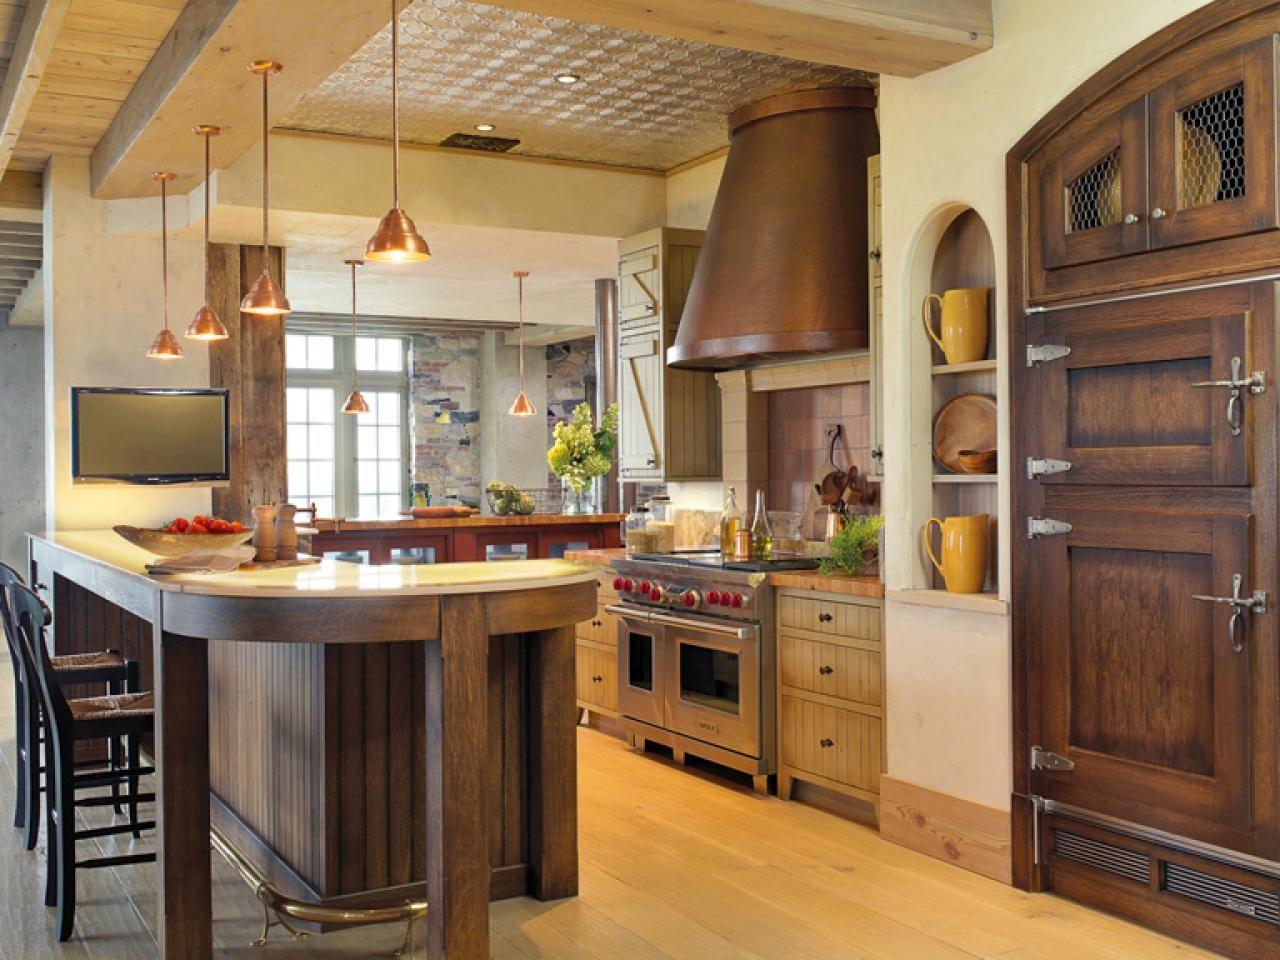 Kitchen Ideas Design Styles and Layout Options Kitchen